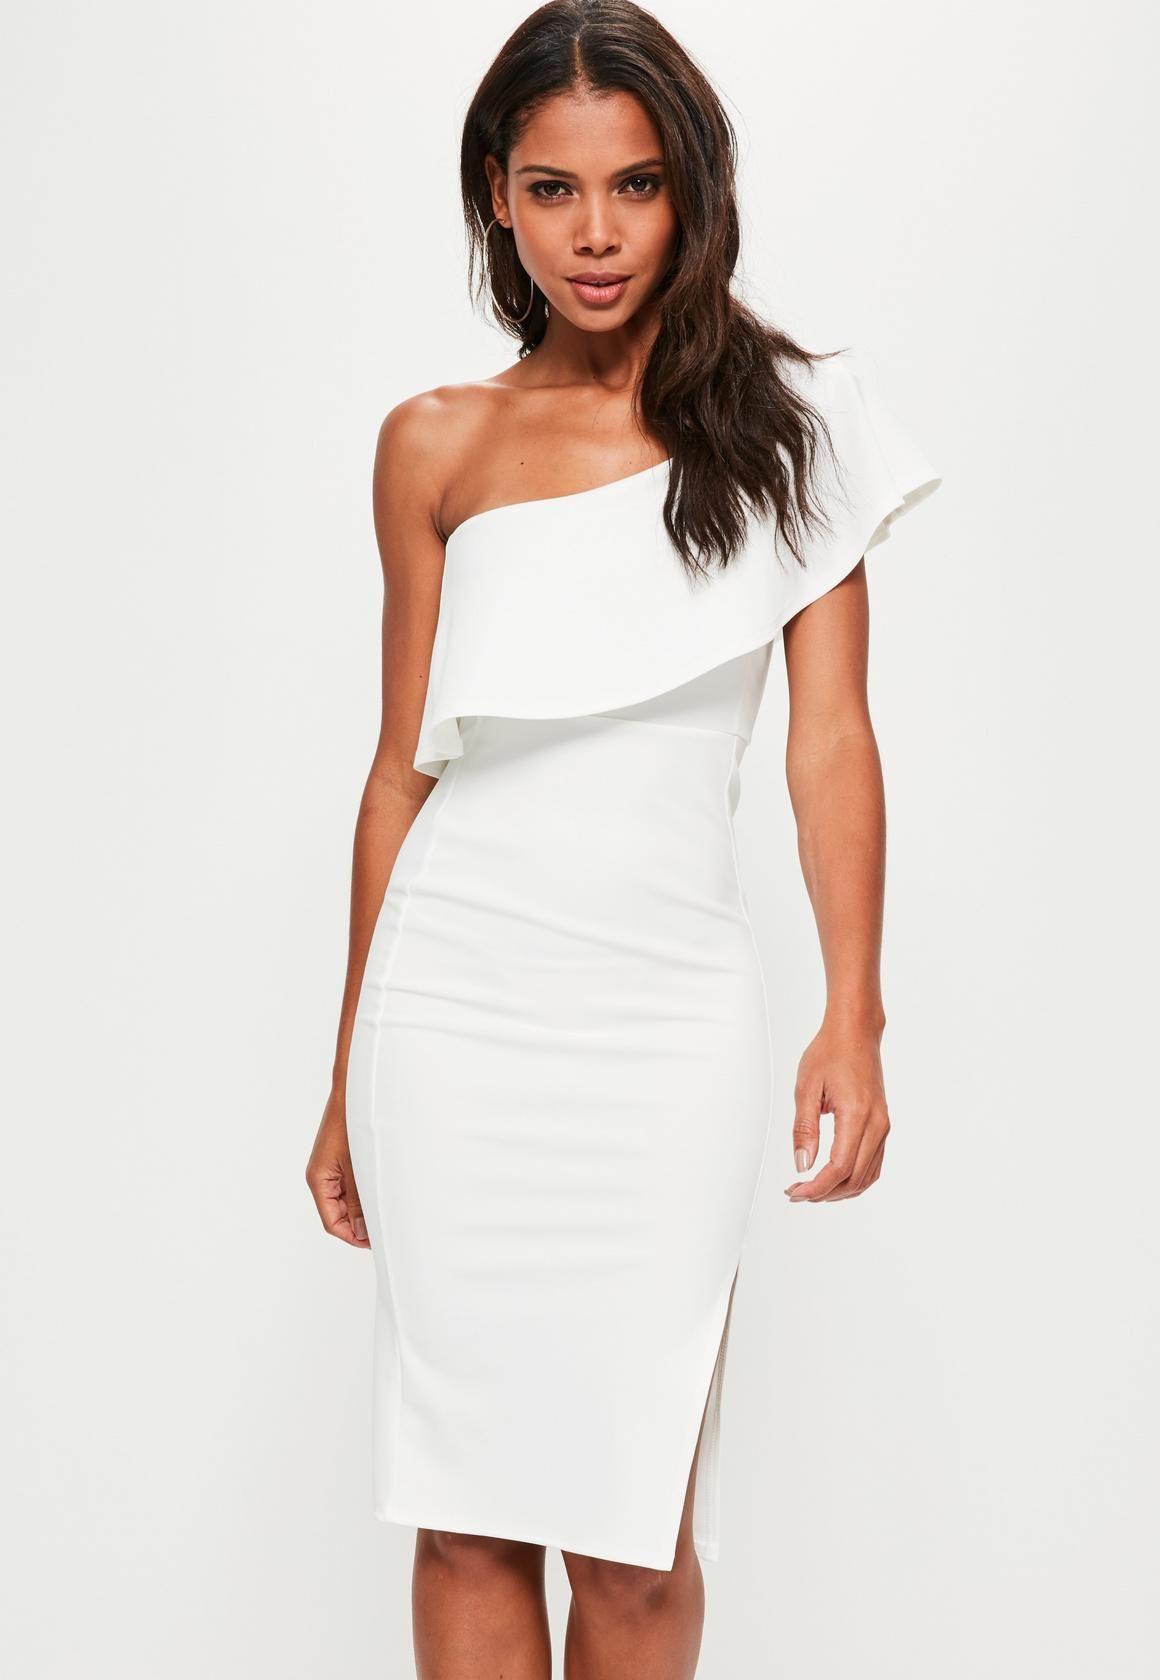 bda6ad61e8a Missguided - White One Shoulder Frill Split Midi Dress | wedding ...